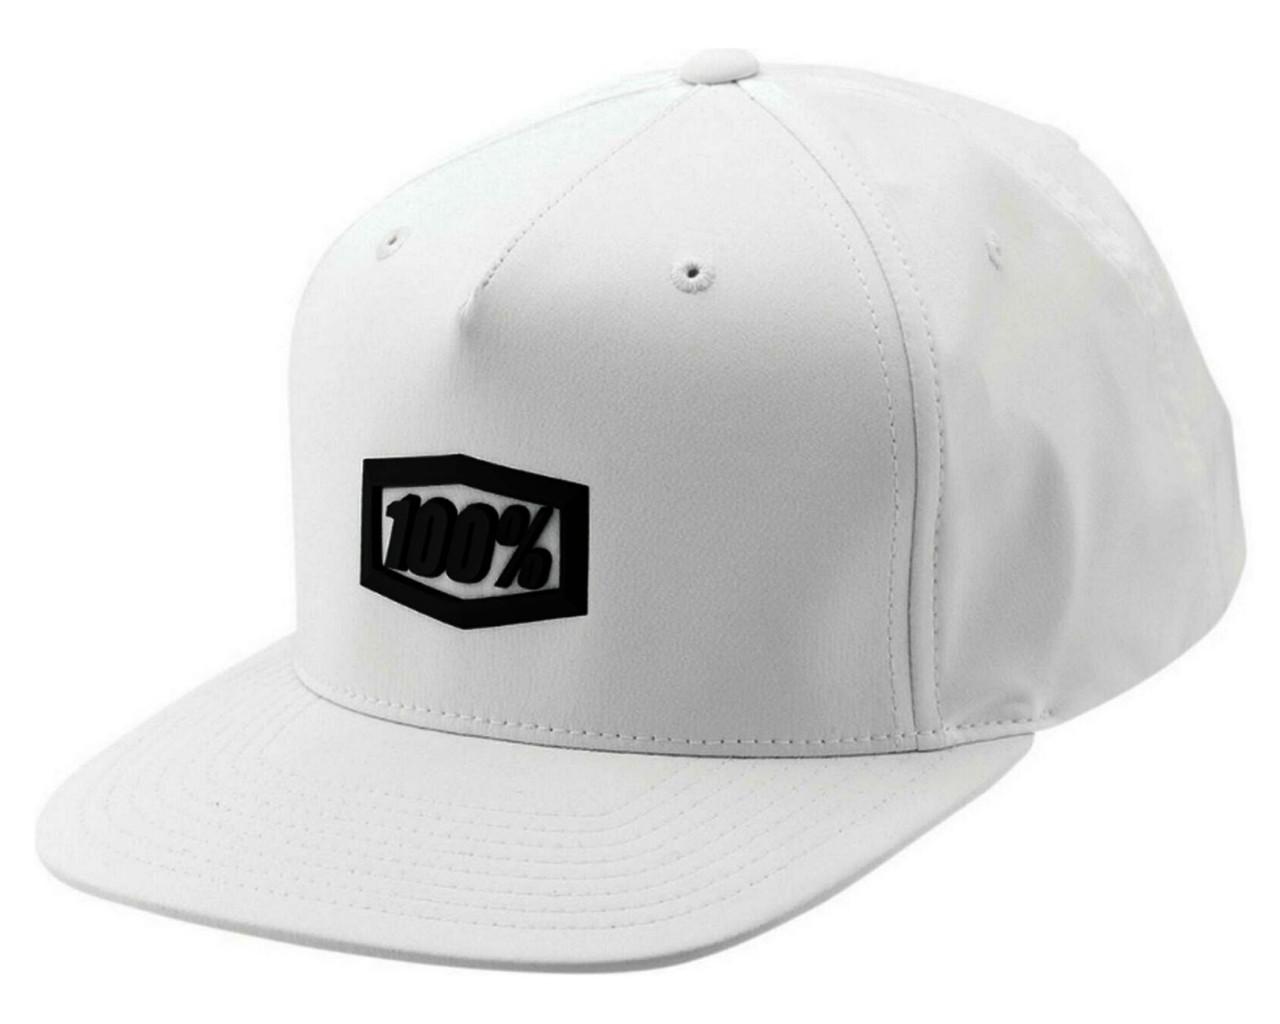 100% Enterprise 2019 Snapback Hat | white